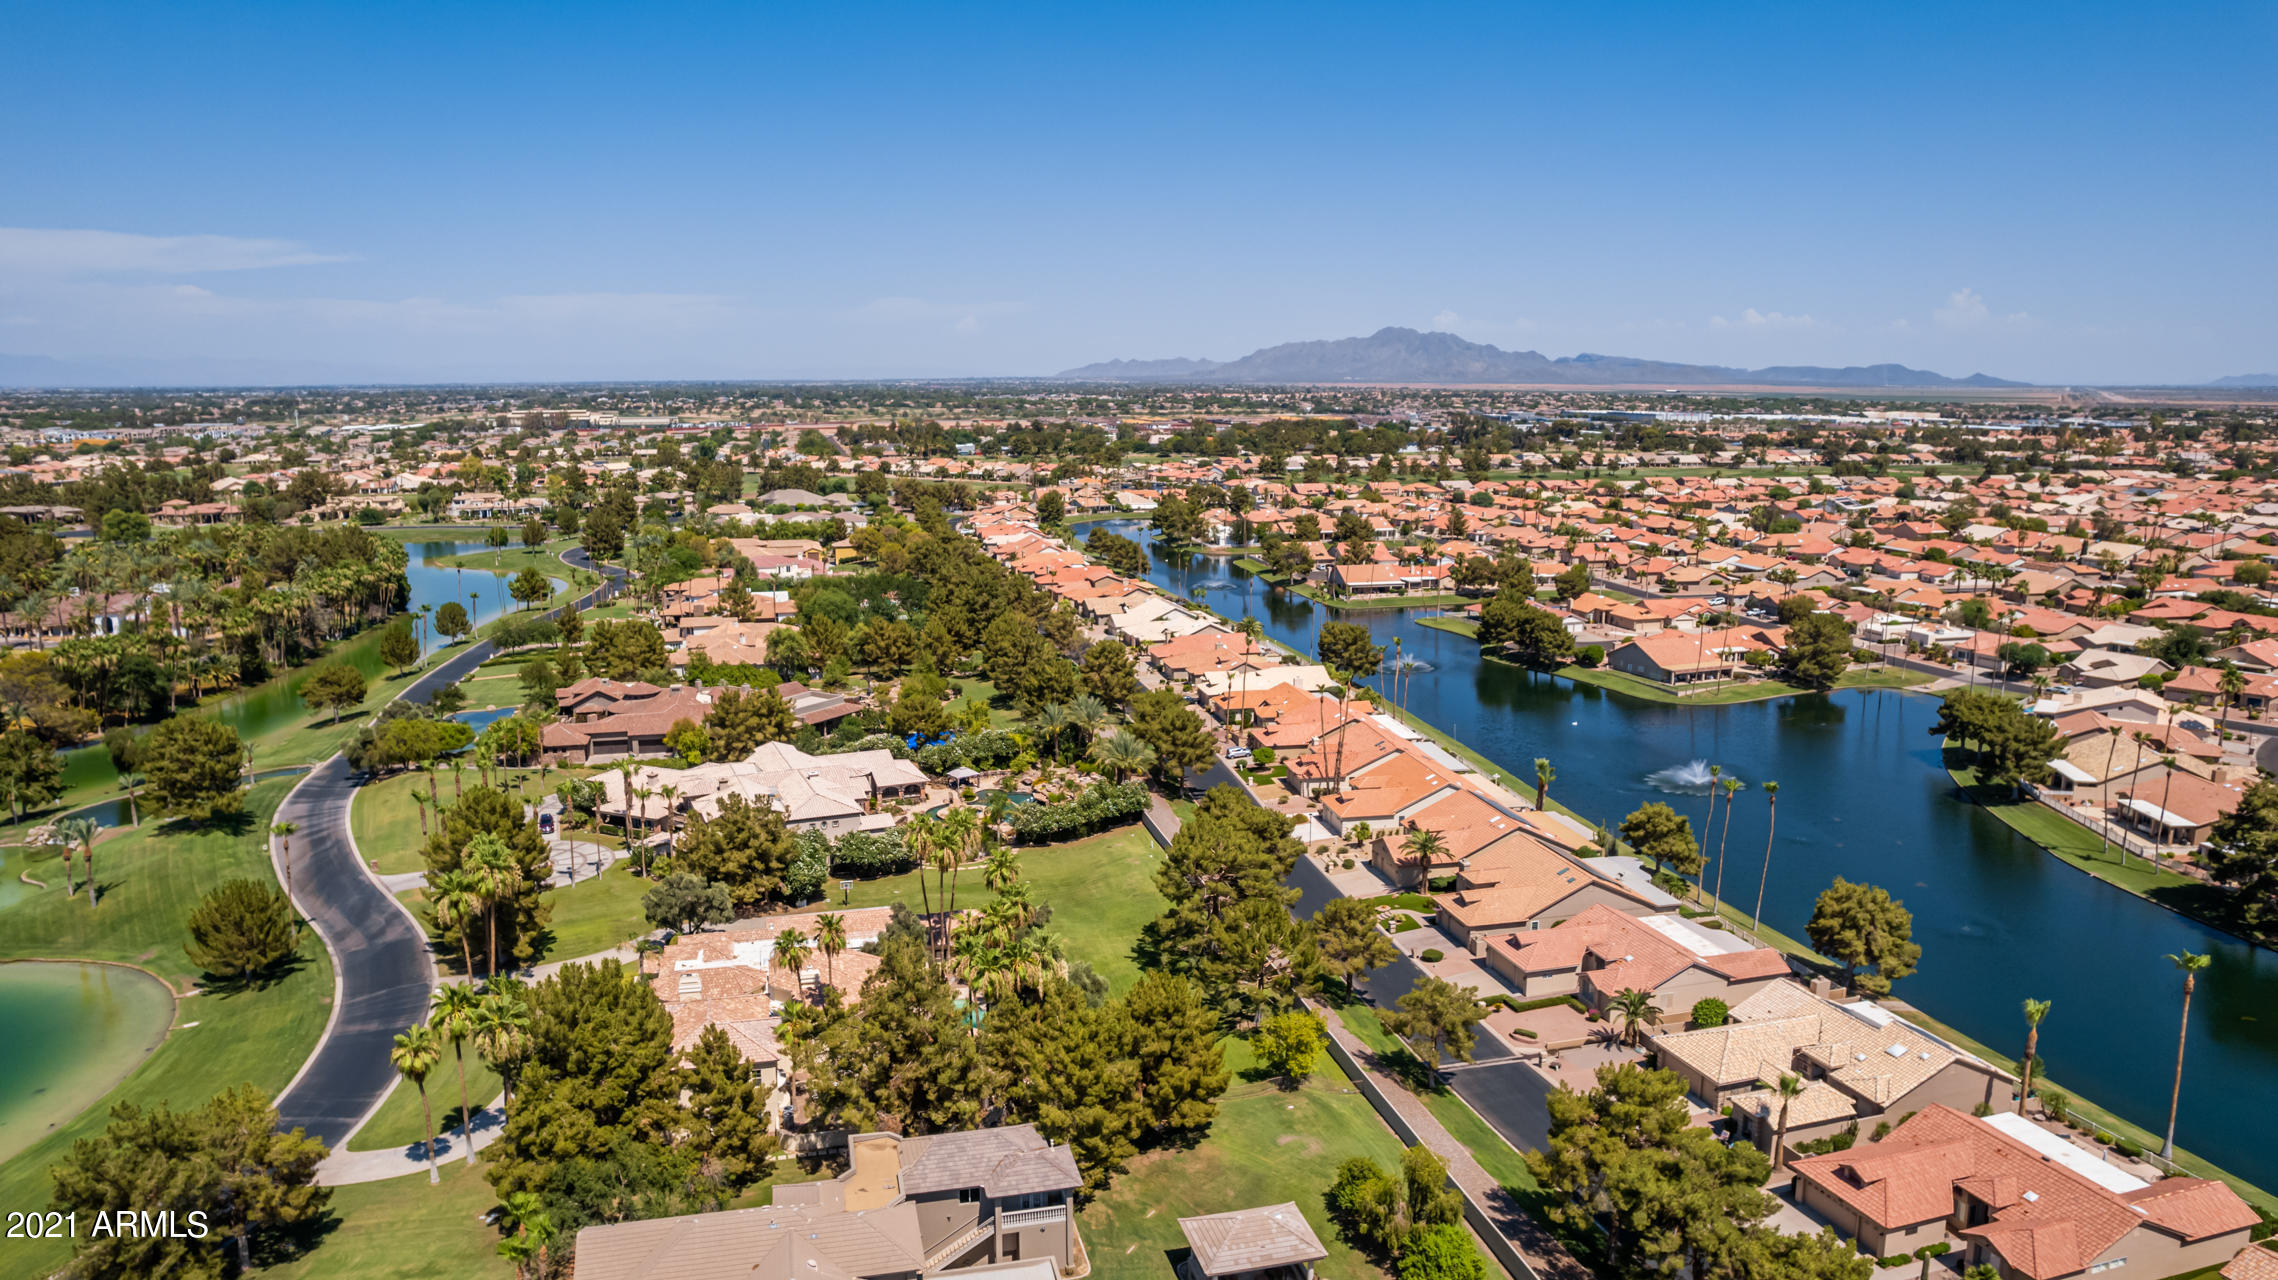 MLS 6263026 7 E OAKWOOD HILLS Drive, Chandler, AZ 85248 Gated Homes